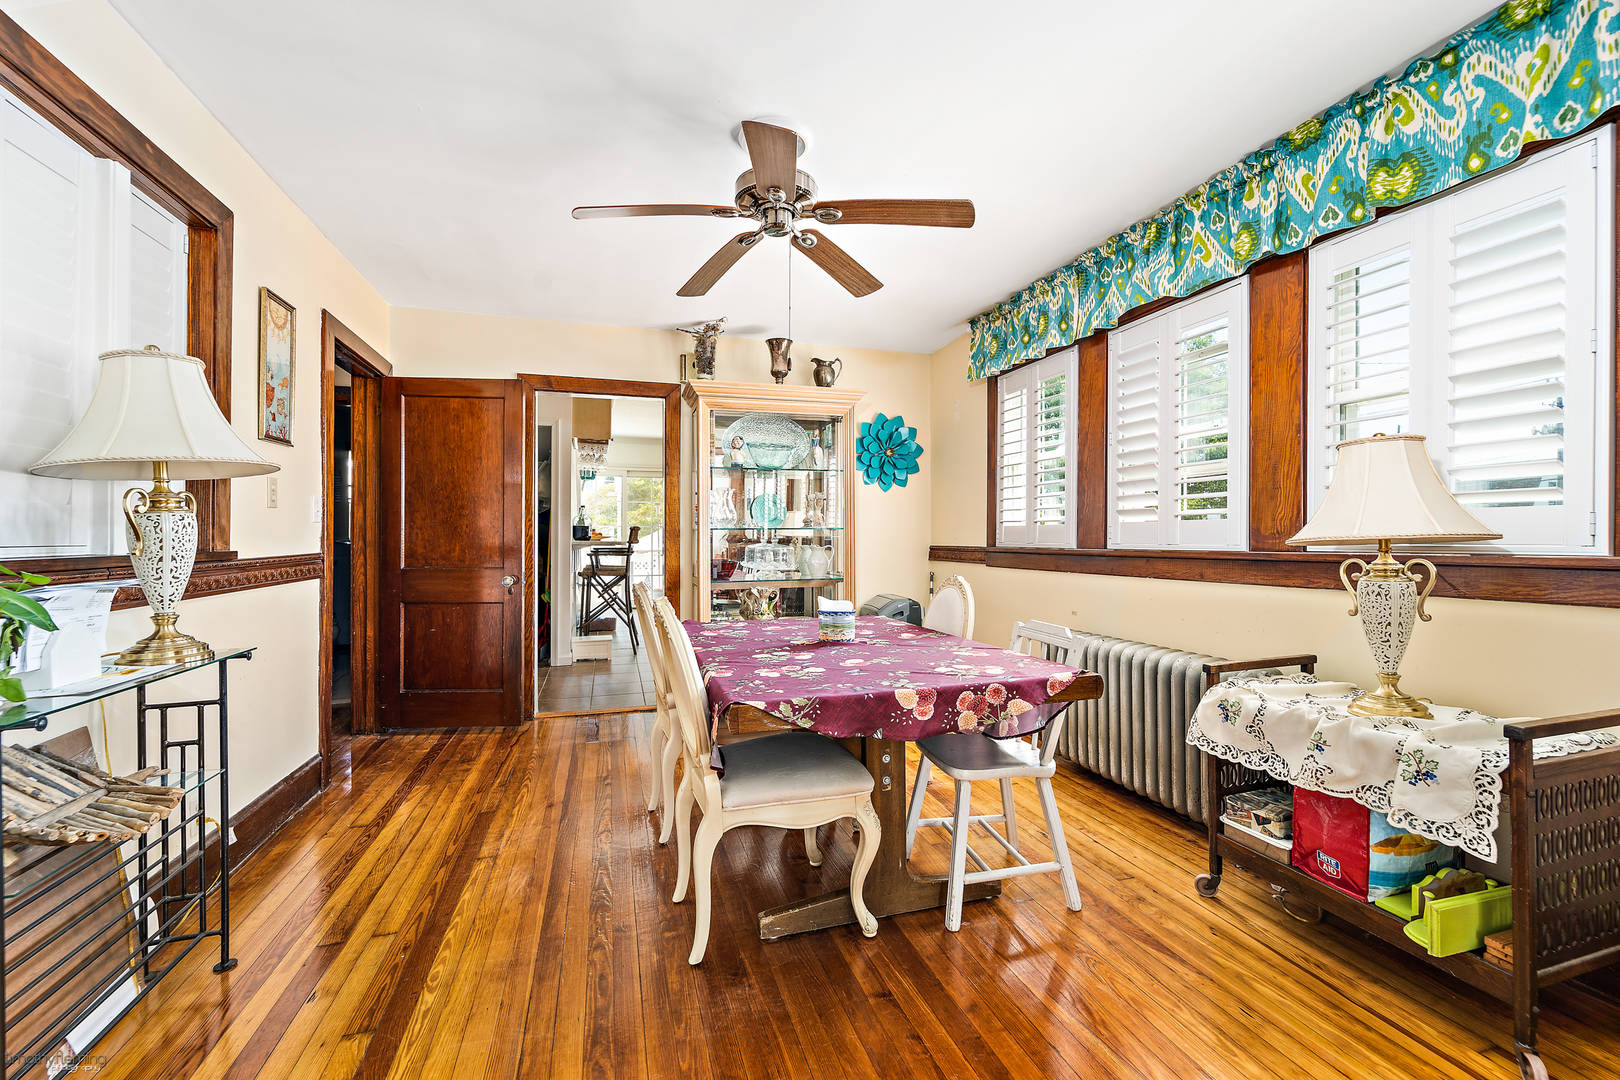 207 W Poplar Wildwood, NJ 08260